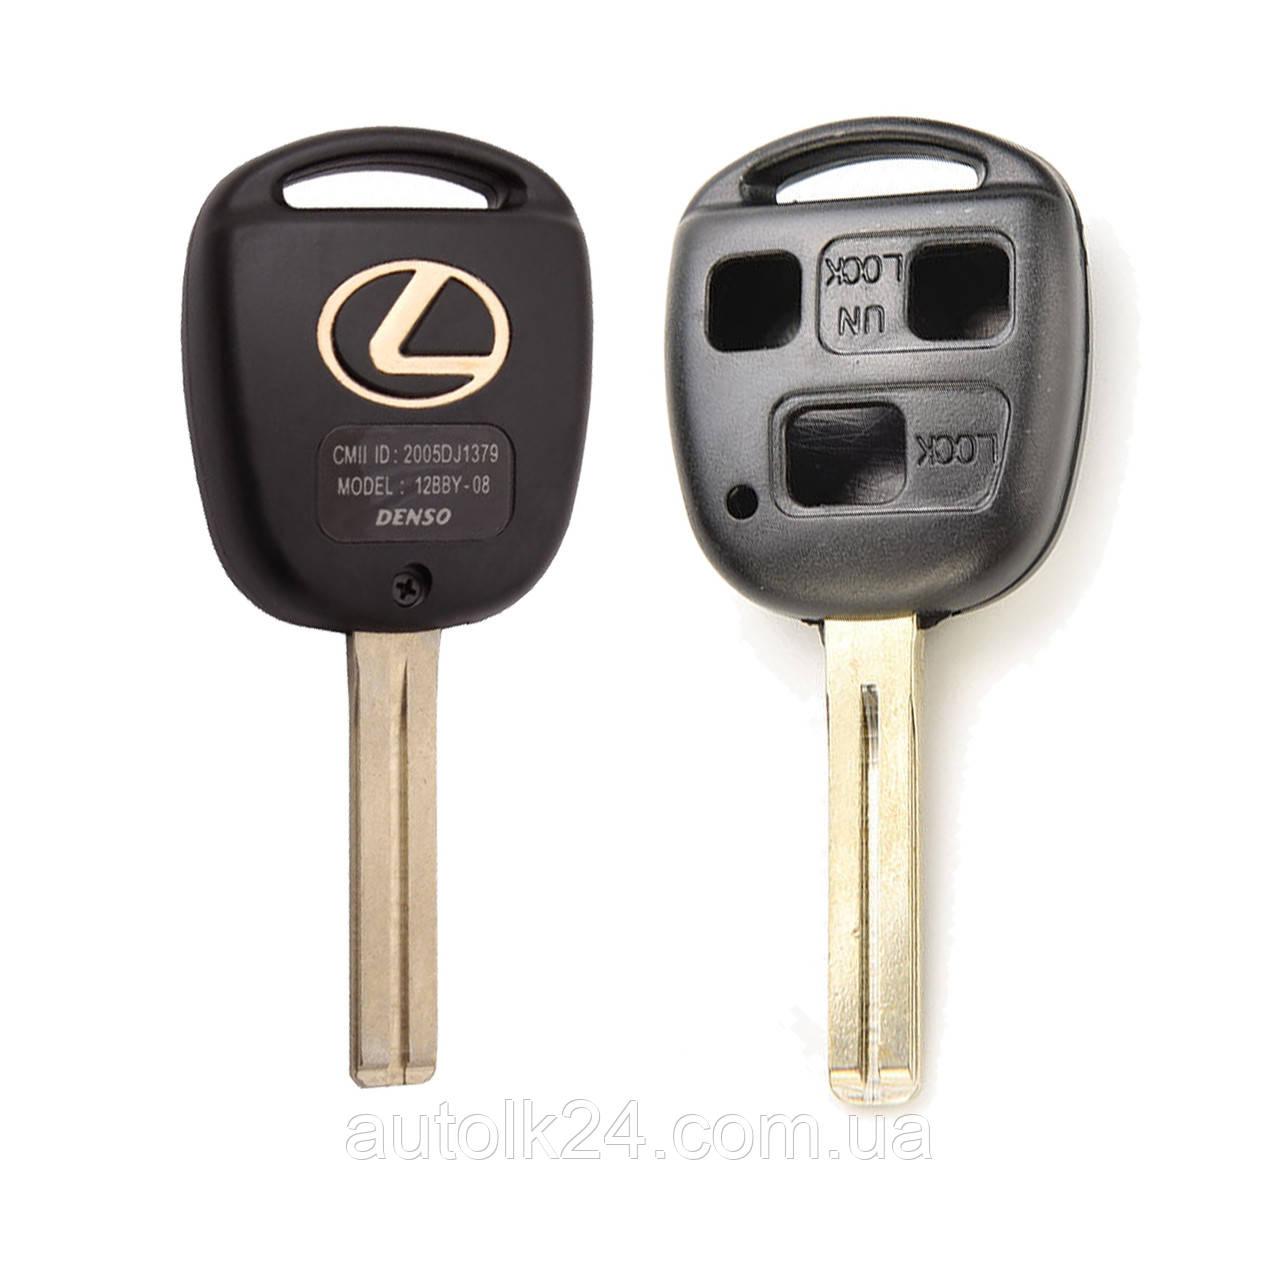 Заготовка корпус ключа LEXUS (Лексус) RX, GX, LX, IS, GS, ES, LS, SC - 3 кнопки, лезвие TOY48